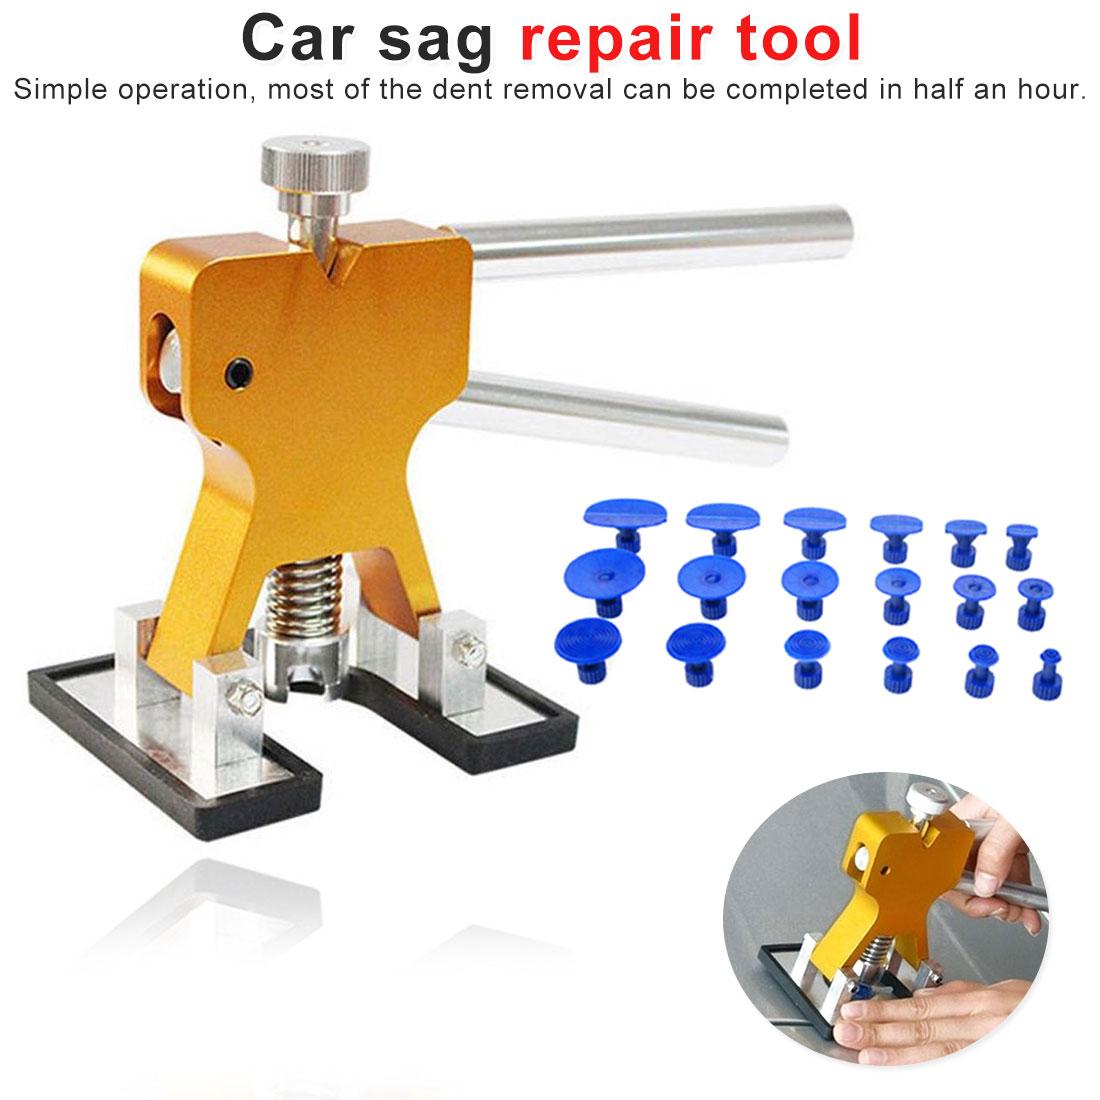 Car Body Paintless Dent Puller Lifter Repair Tool +18 Tabs Car Dent Remover Car Dent Repair Tools Cars Tool Kit Hand Tool Sets